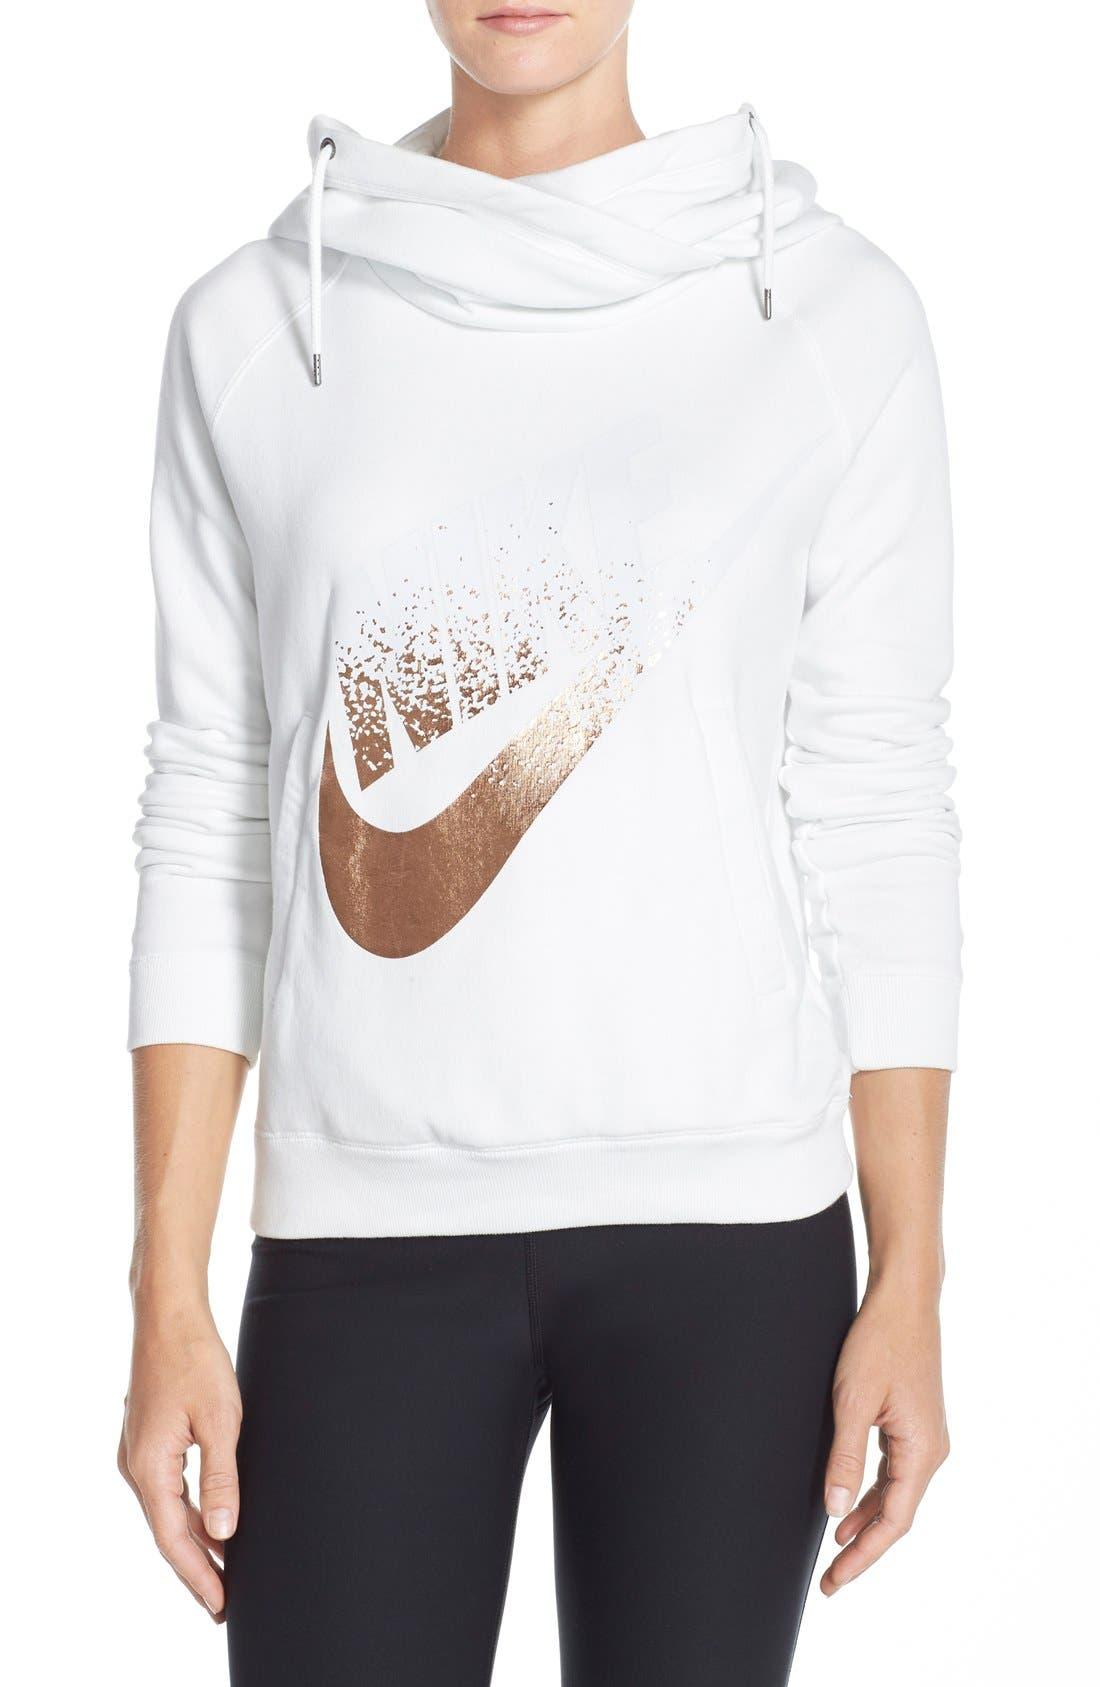 Alternate Image 1 Selected - Nike 'Rally' Foiled Logo Hoodie